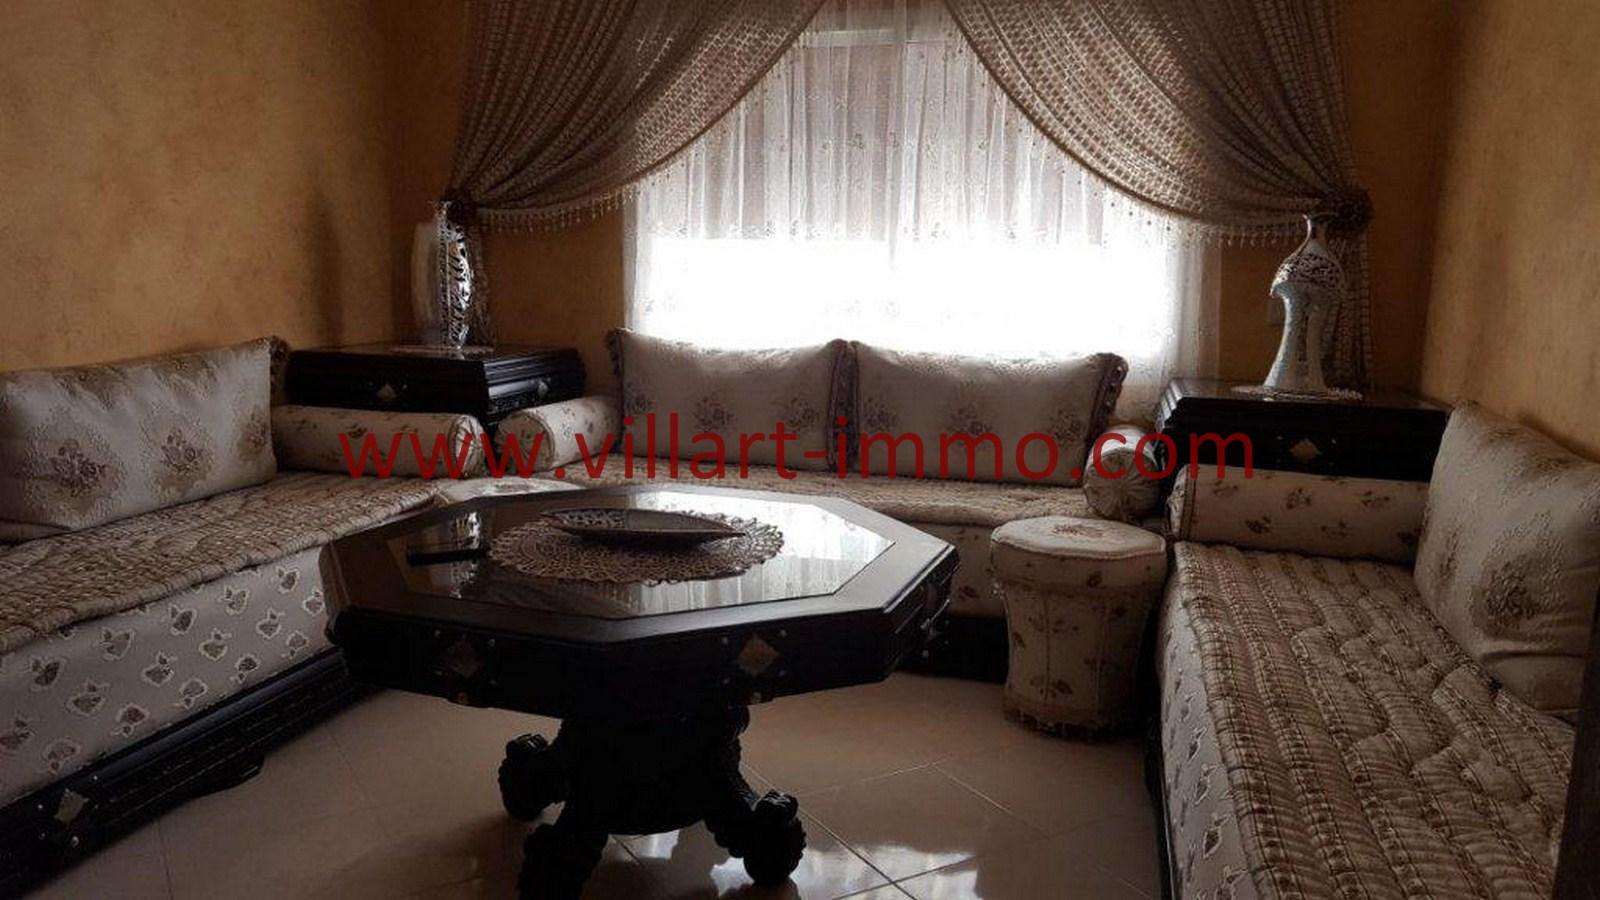 1-Vente-Appartement-Tanger-Salon 1-VA514-Route de Rabat-Villart Immo